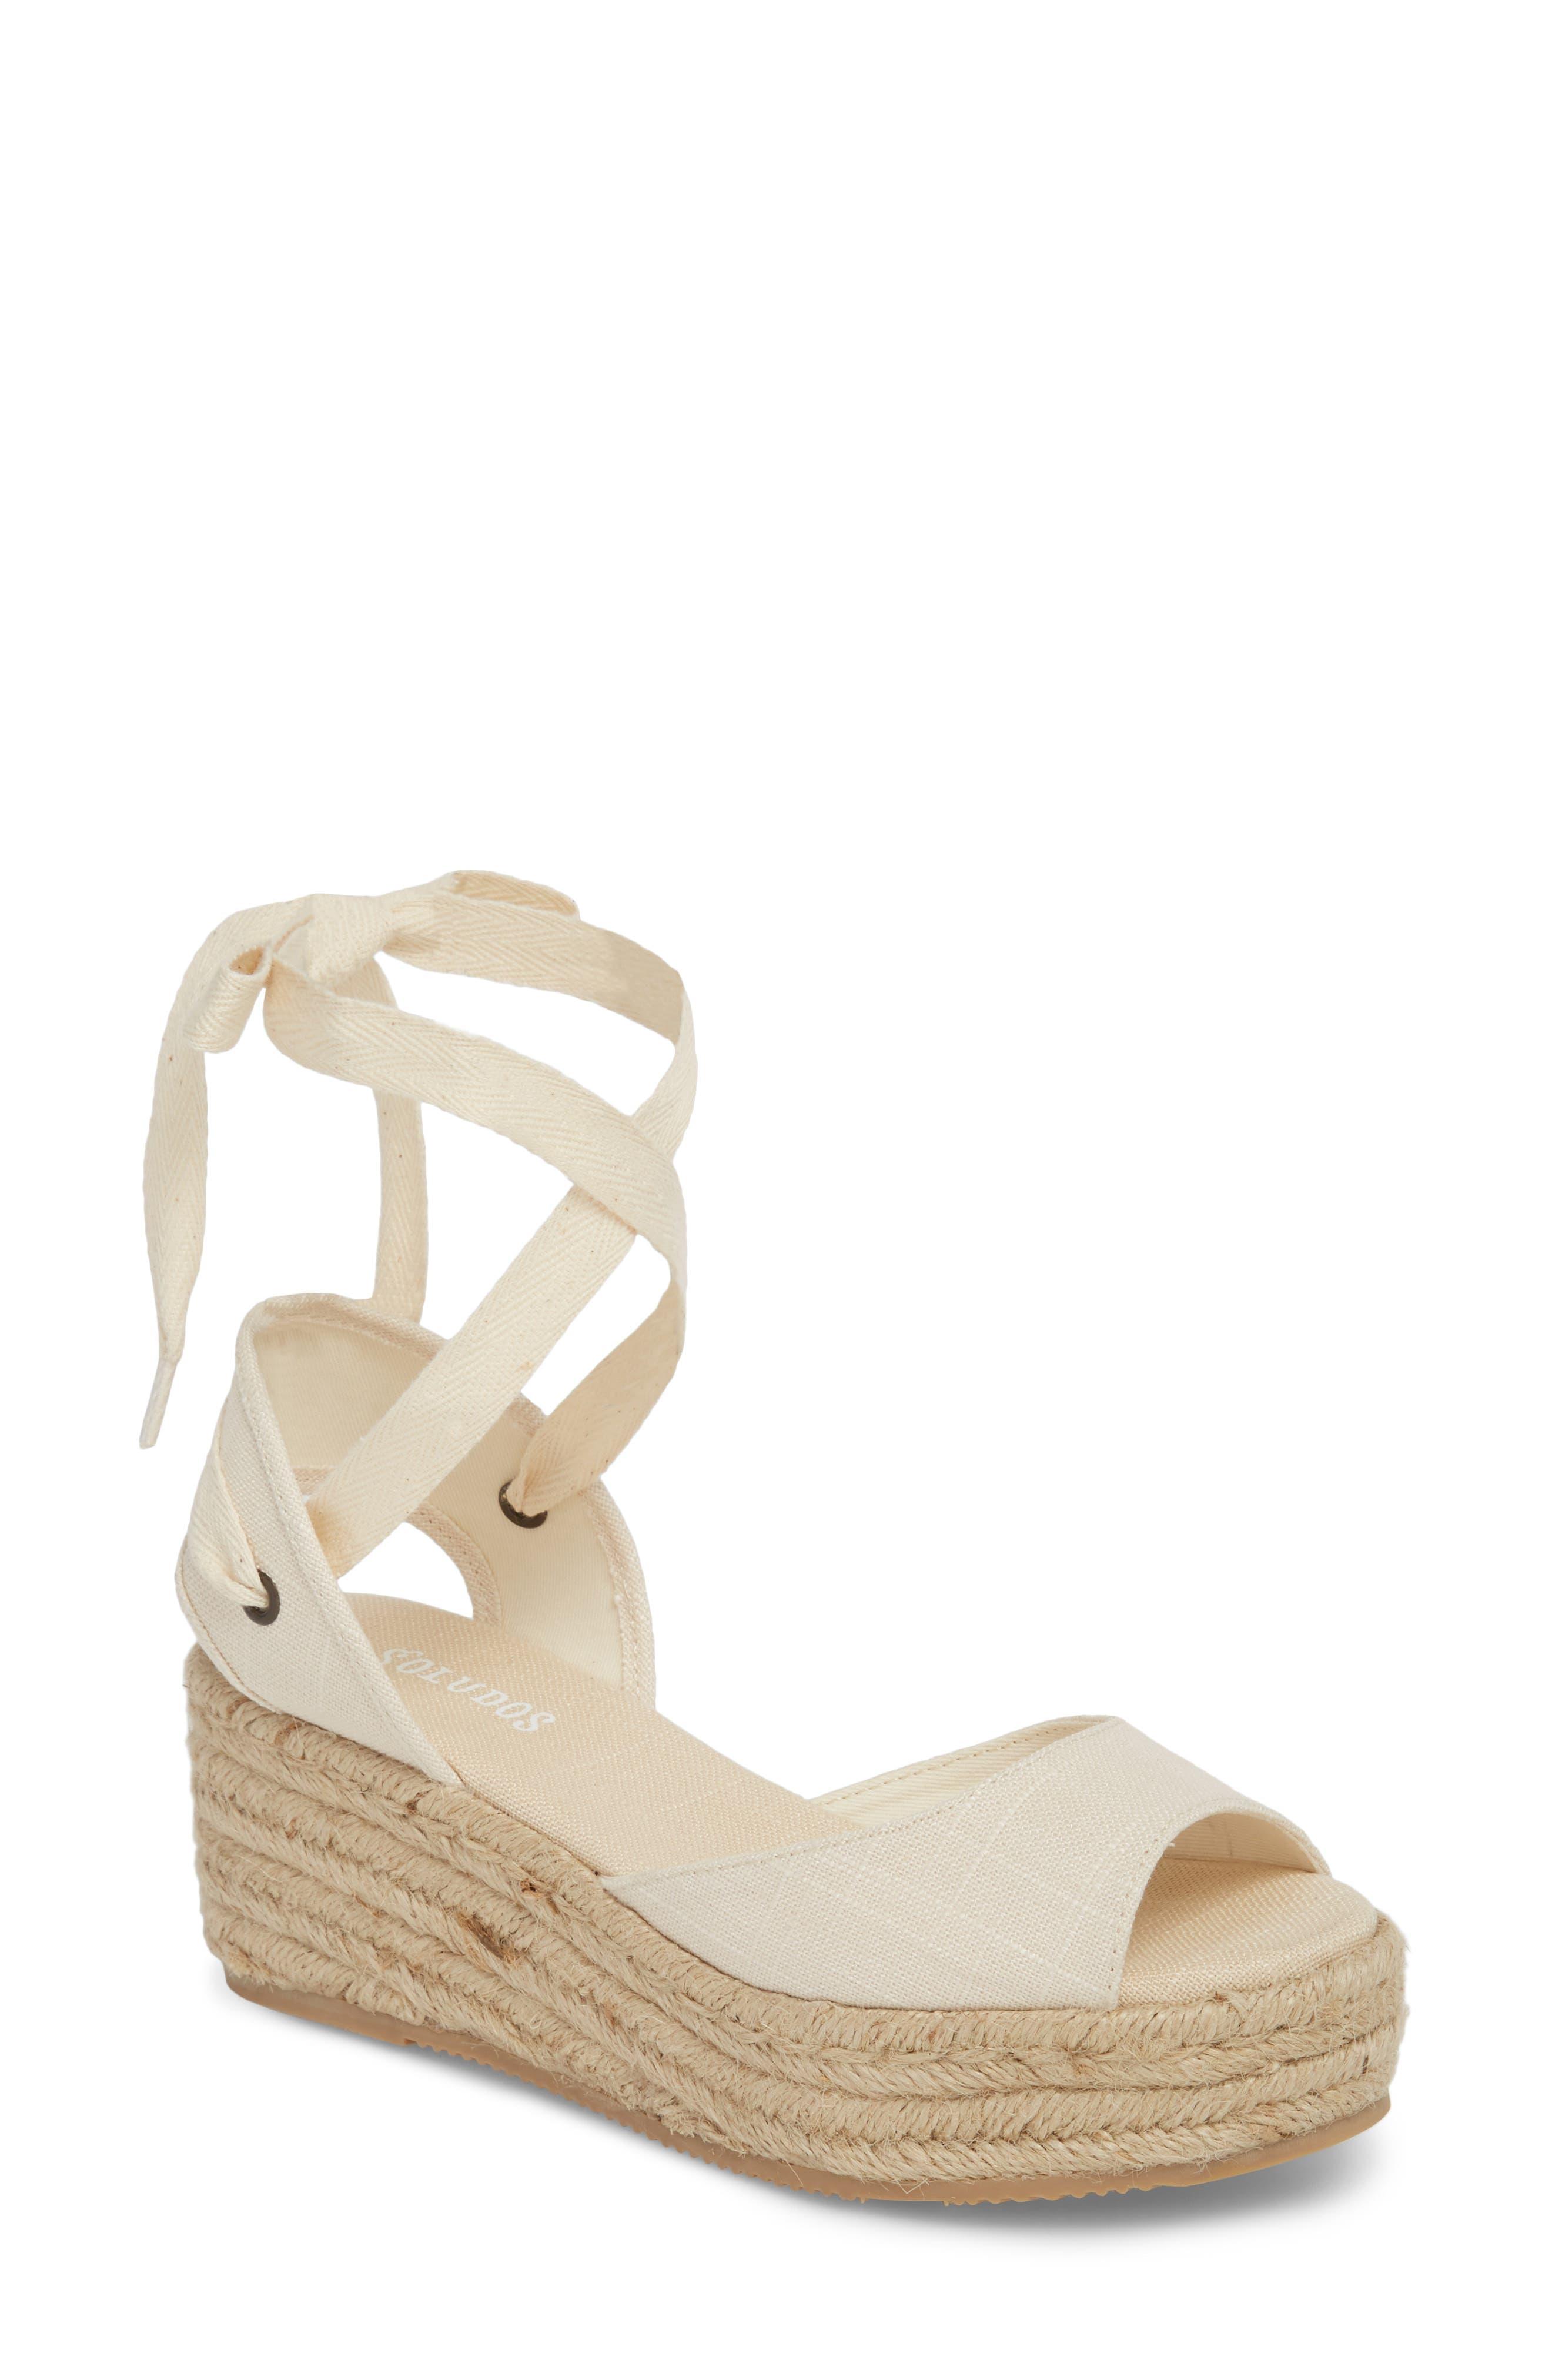 Espadrille Platform Sandal,                             Main thumbnail 1, color,                             Blush Fabric